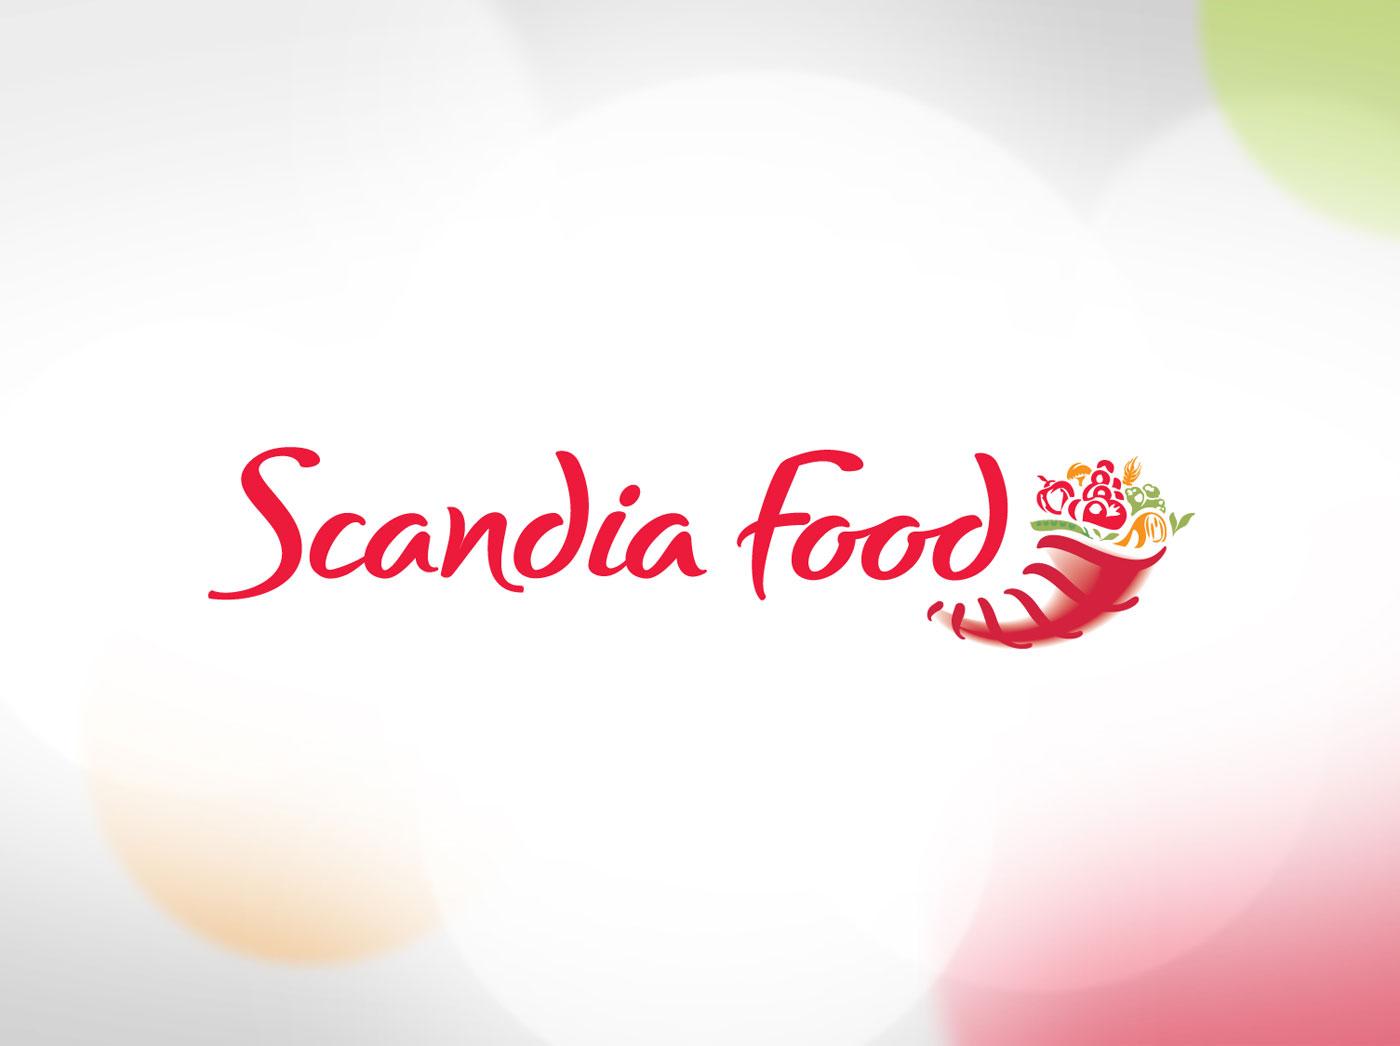 scandia food portofoliu inoveo logo